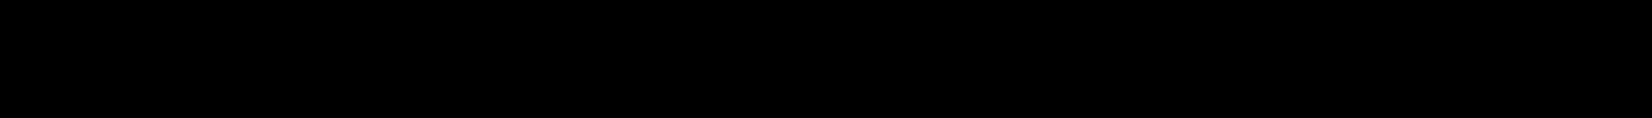 {\displaystyle det(A)={\begin{pmatrix}a_{1,1}&a_{1,2}&a_{1,3}\\a_{2,1}&a_{2,2}&a_{2,3}\\a_{3,1}&a_{3,2}&a_{3,3}\end{pmatrix}}=a_{1,1}*a_{2,2}*a_{3,3}+a_{1,2}*a_{2,3}*a_{3,1}+a_{1,3}*a_{2,1}*a_{3,2}-a_{1,3}*a_{2,2}*a_{3,1}-a_{1,2}*a_{2,1}*a_{3,3}-a_{1,1}*a_{2,3}*a_{3,3}}